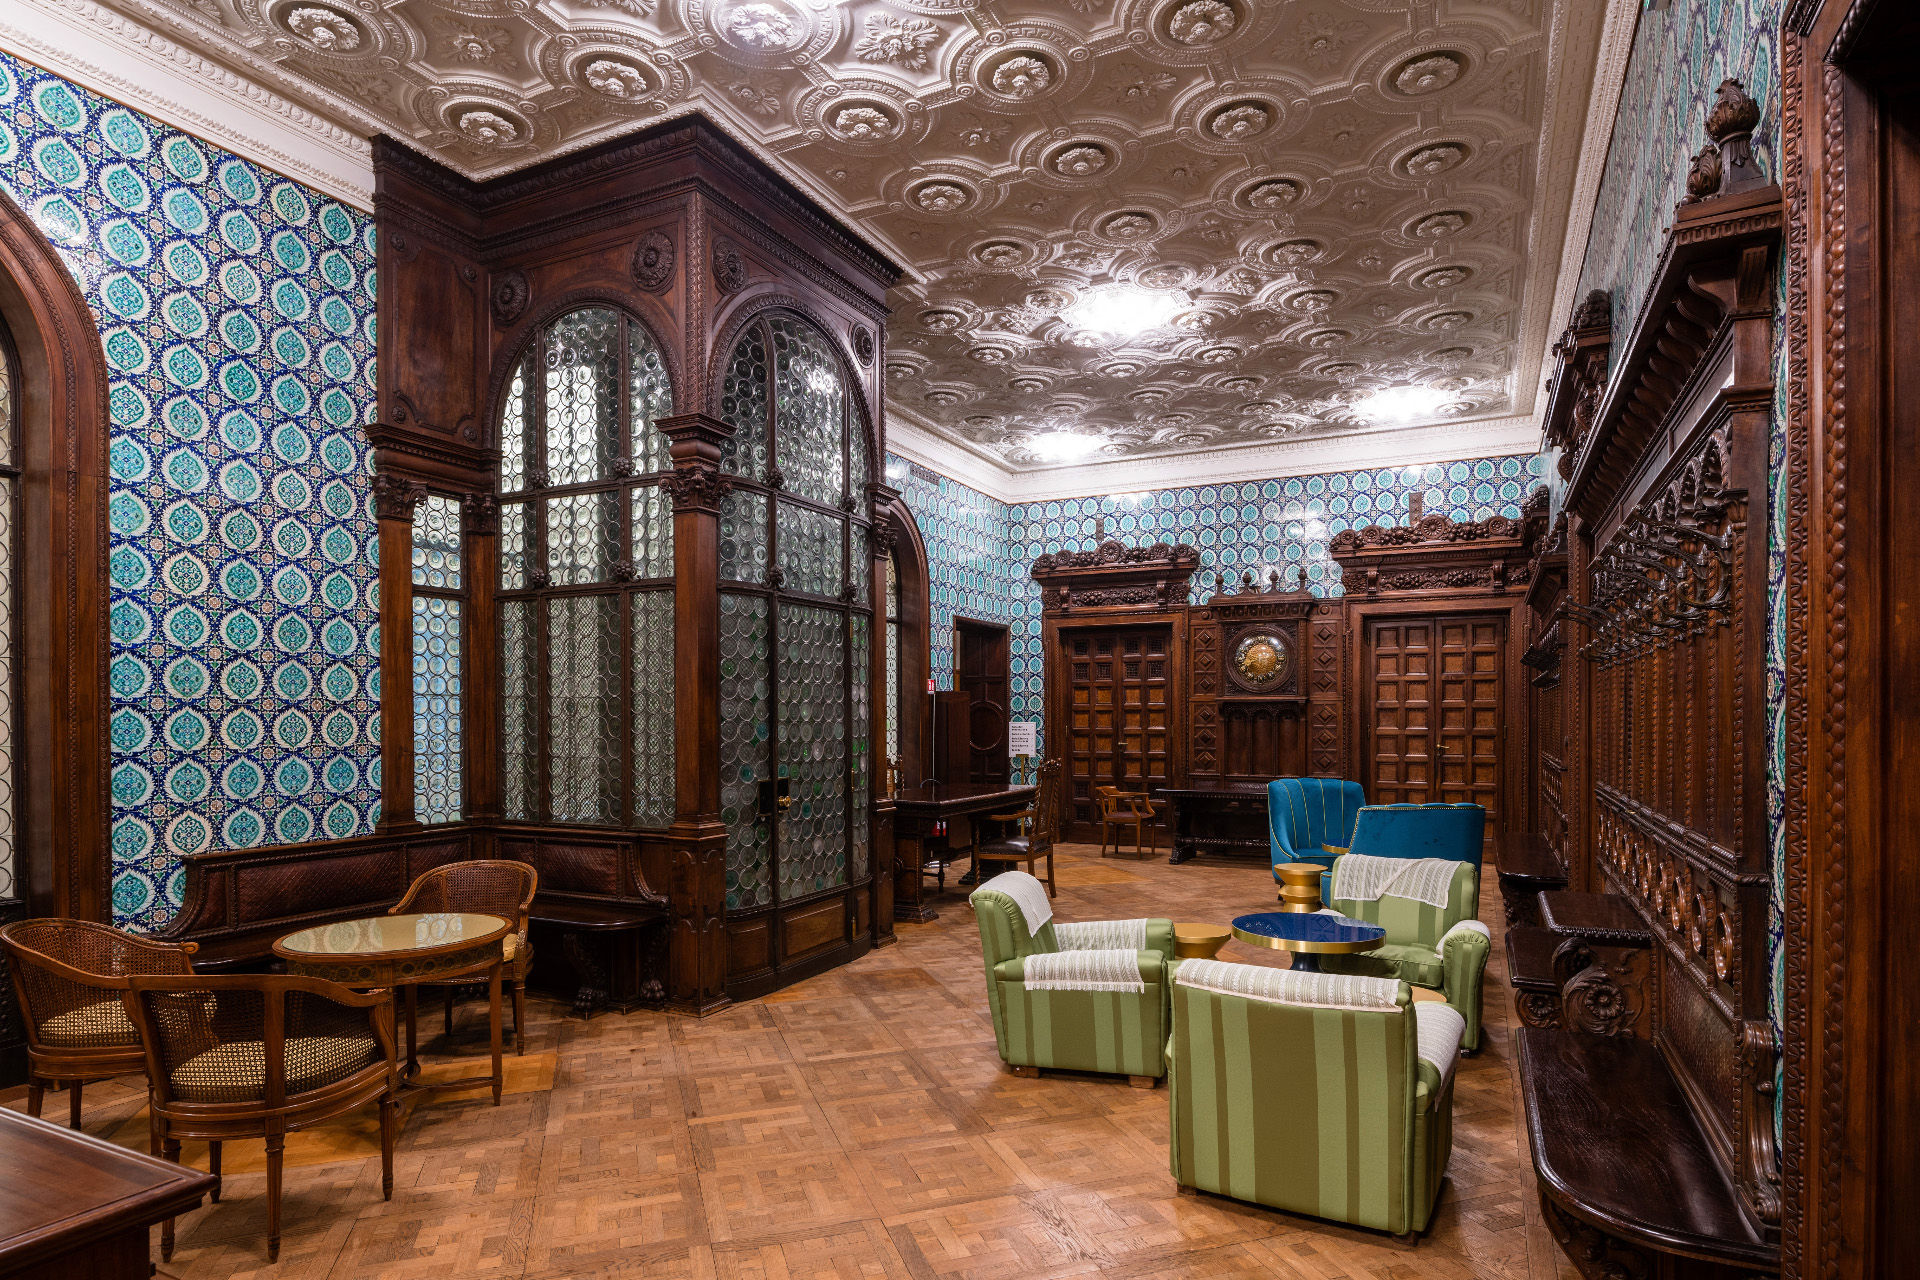 Palazzo ex Ras - Nuovo Hotel Hilton - image 6